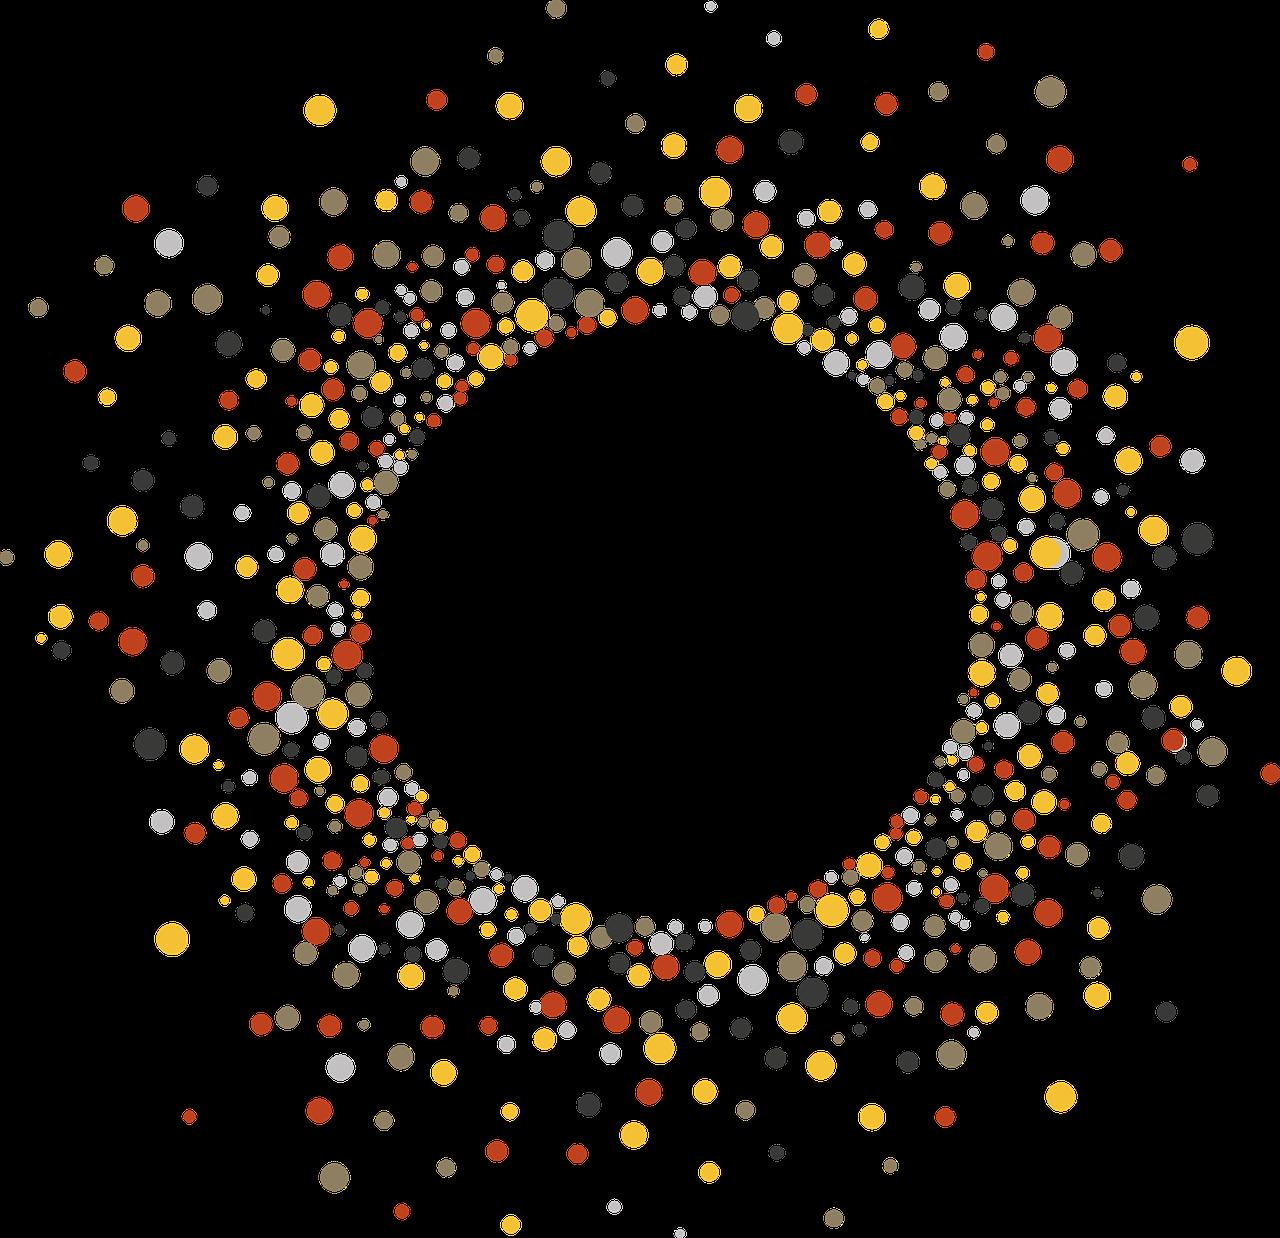 circle, graphic, vector